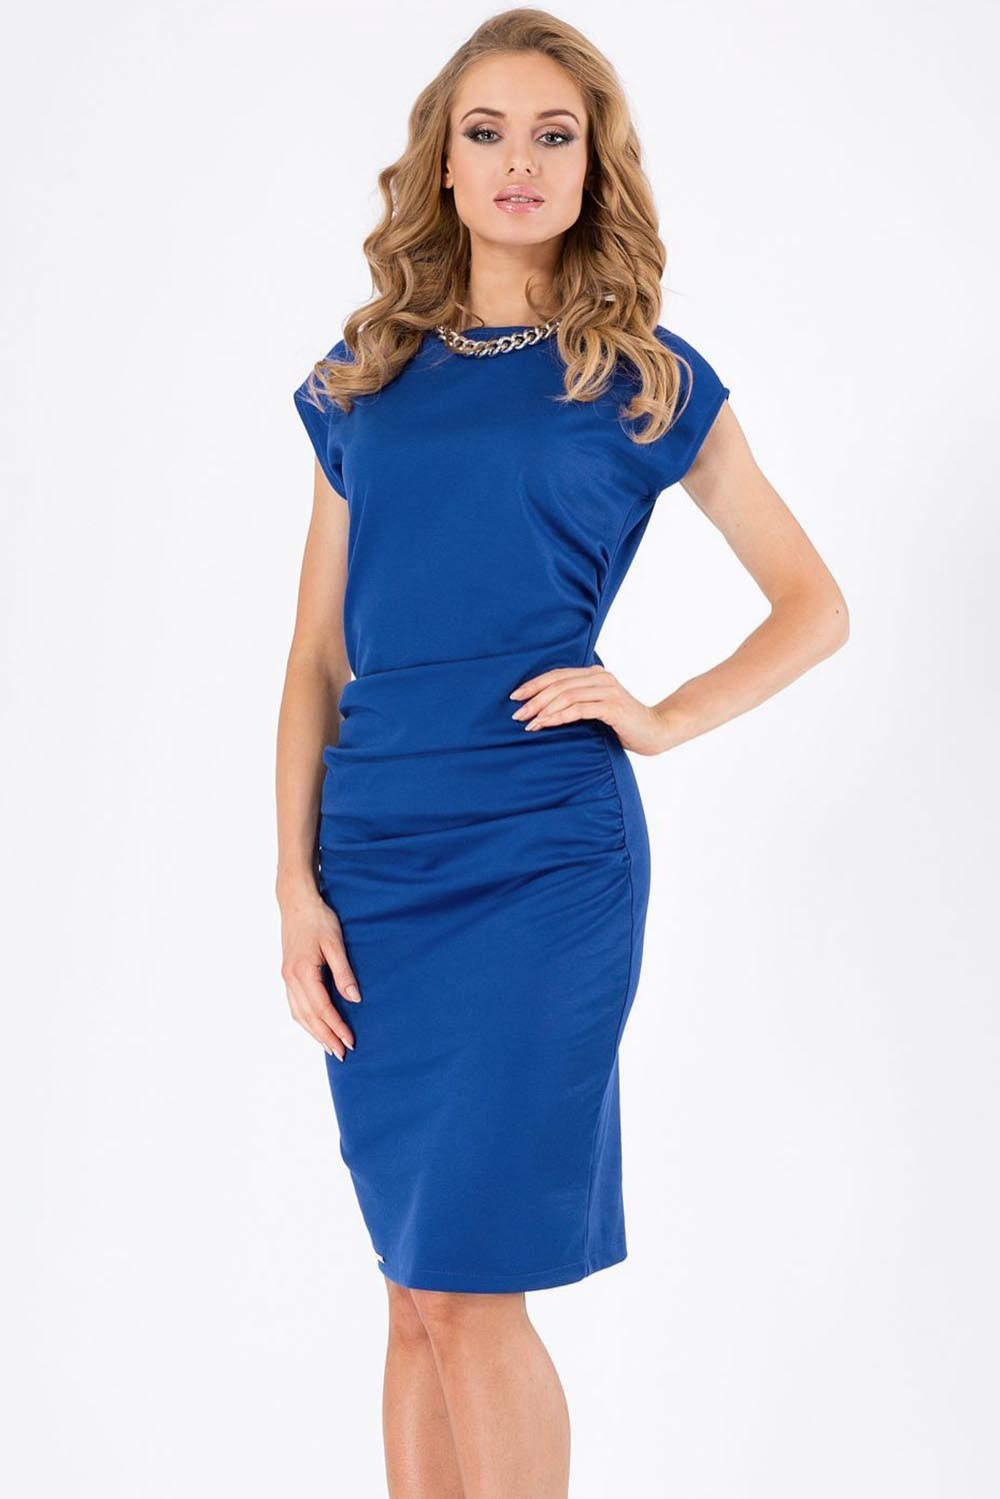 b7ed2ef5b7 Chabrowa sukienka marki Makadamia r. 36 - 6856589220 - oficjalne ...